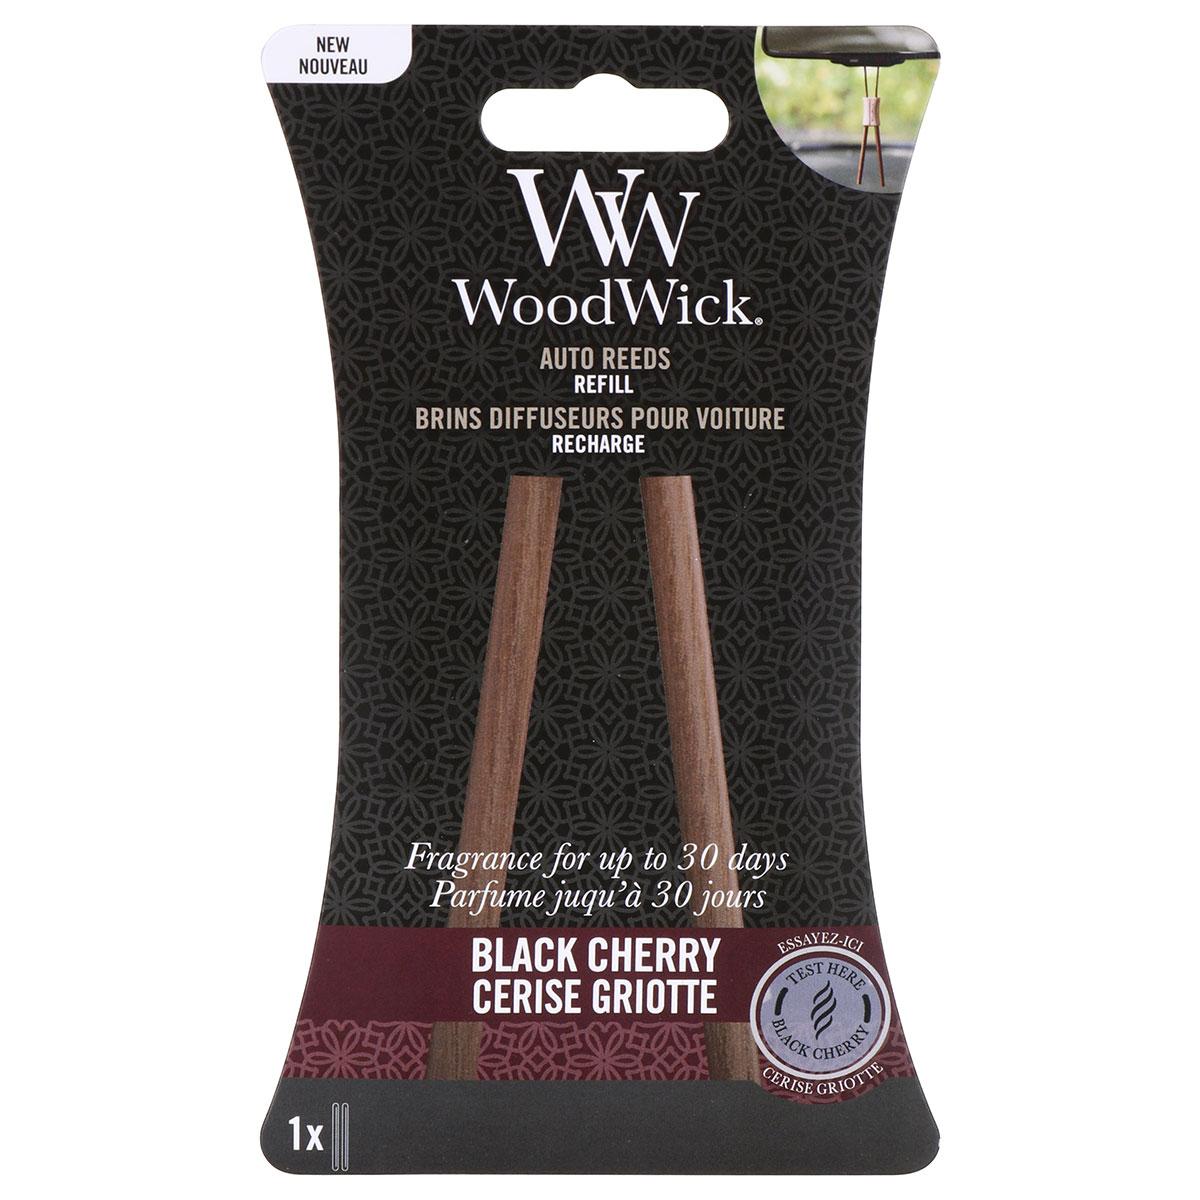 WoodWick Black Cherry Auto Reeds Refill